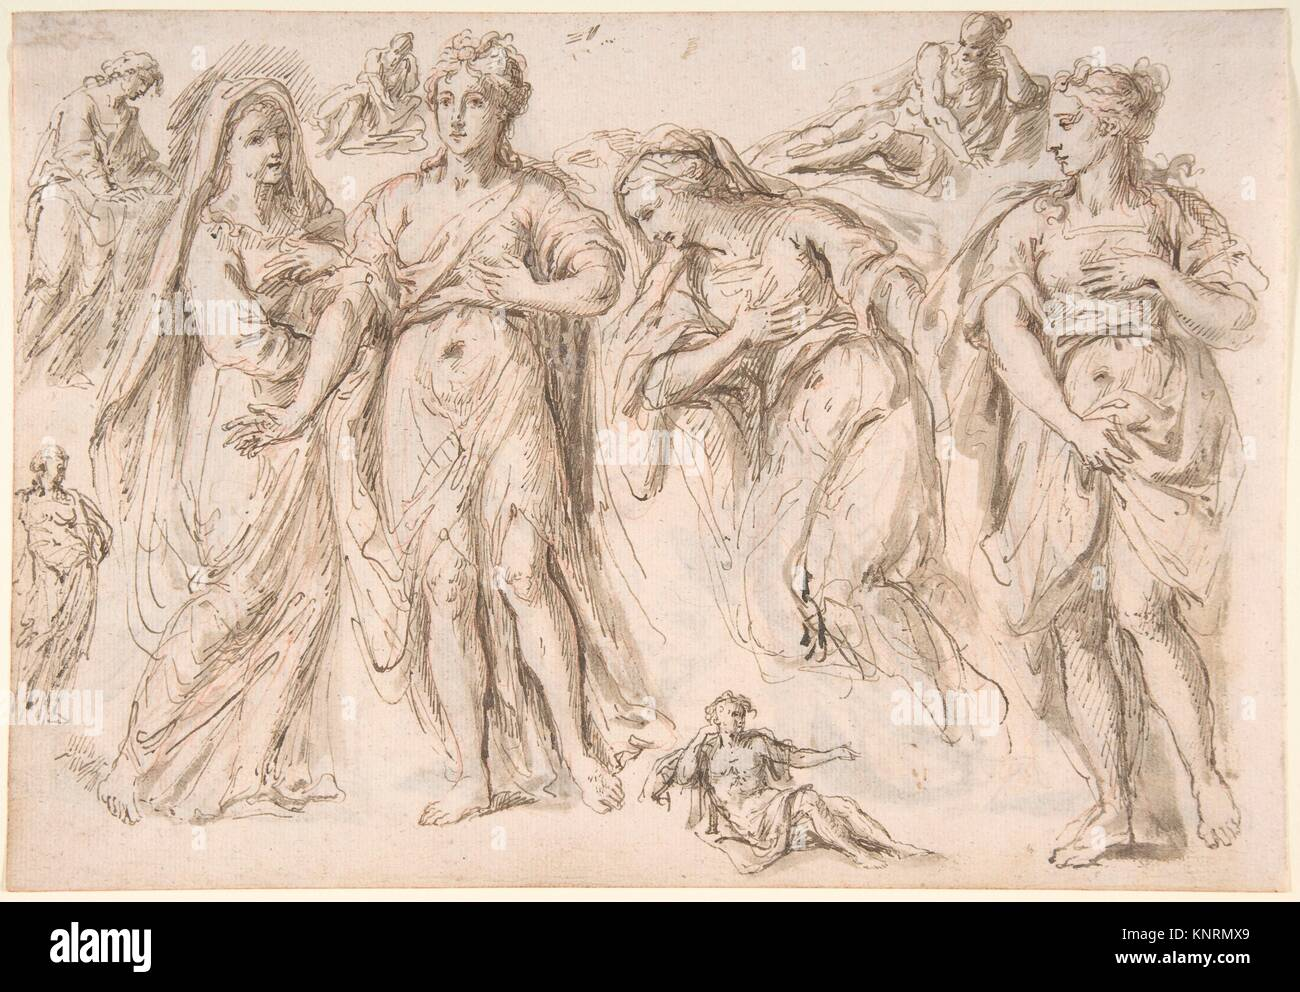 Studies of draped female and male figures; verso: Studies of draped female figures. Artist: Bartholomaeus Ignaz - Stock Image